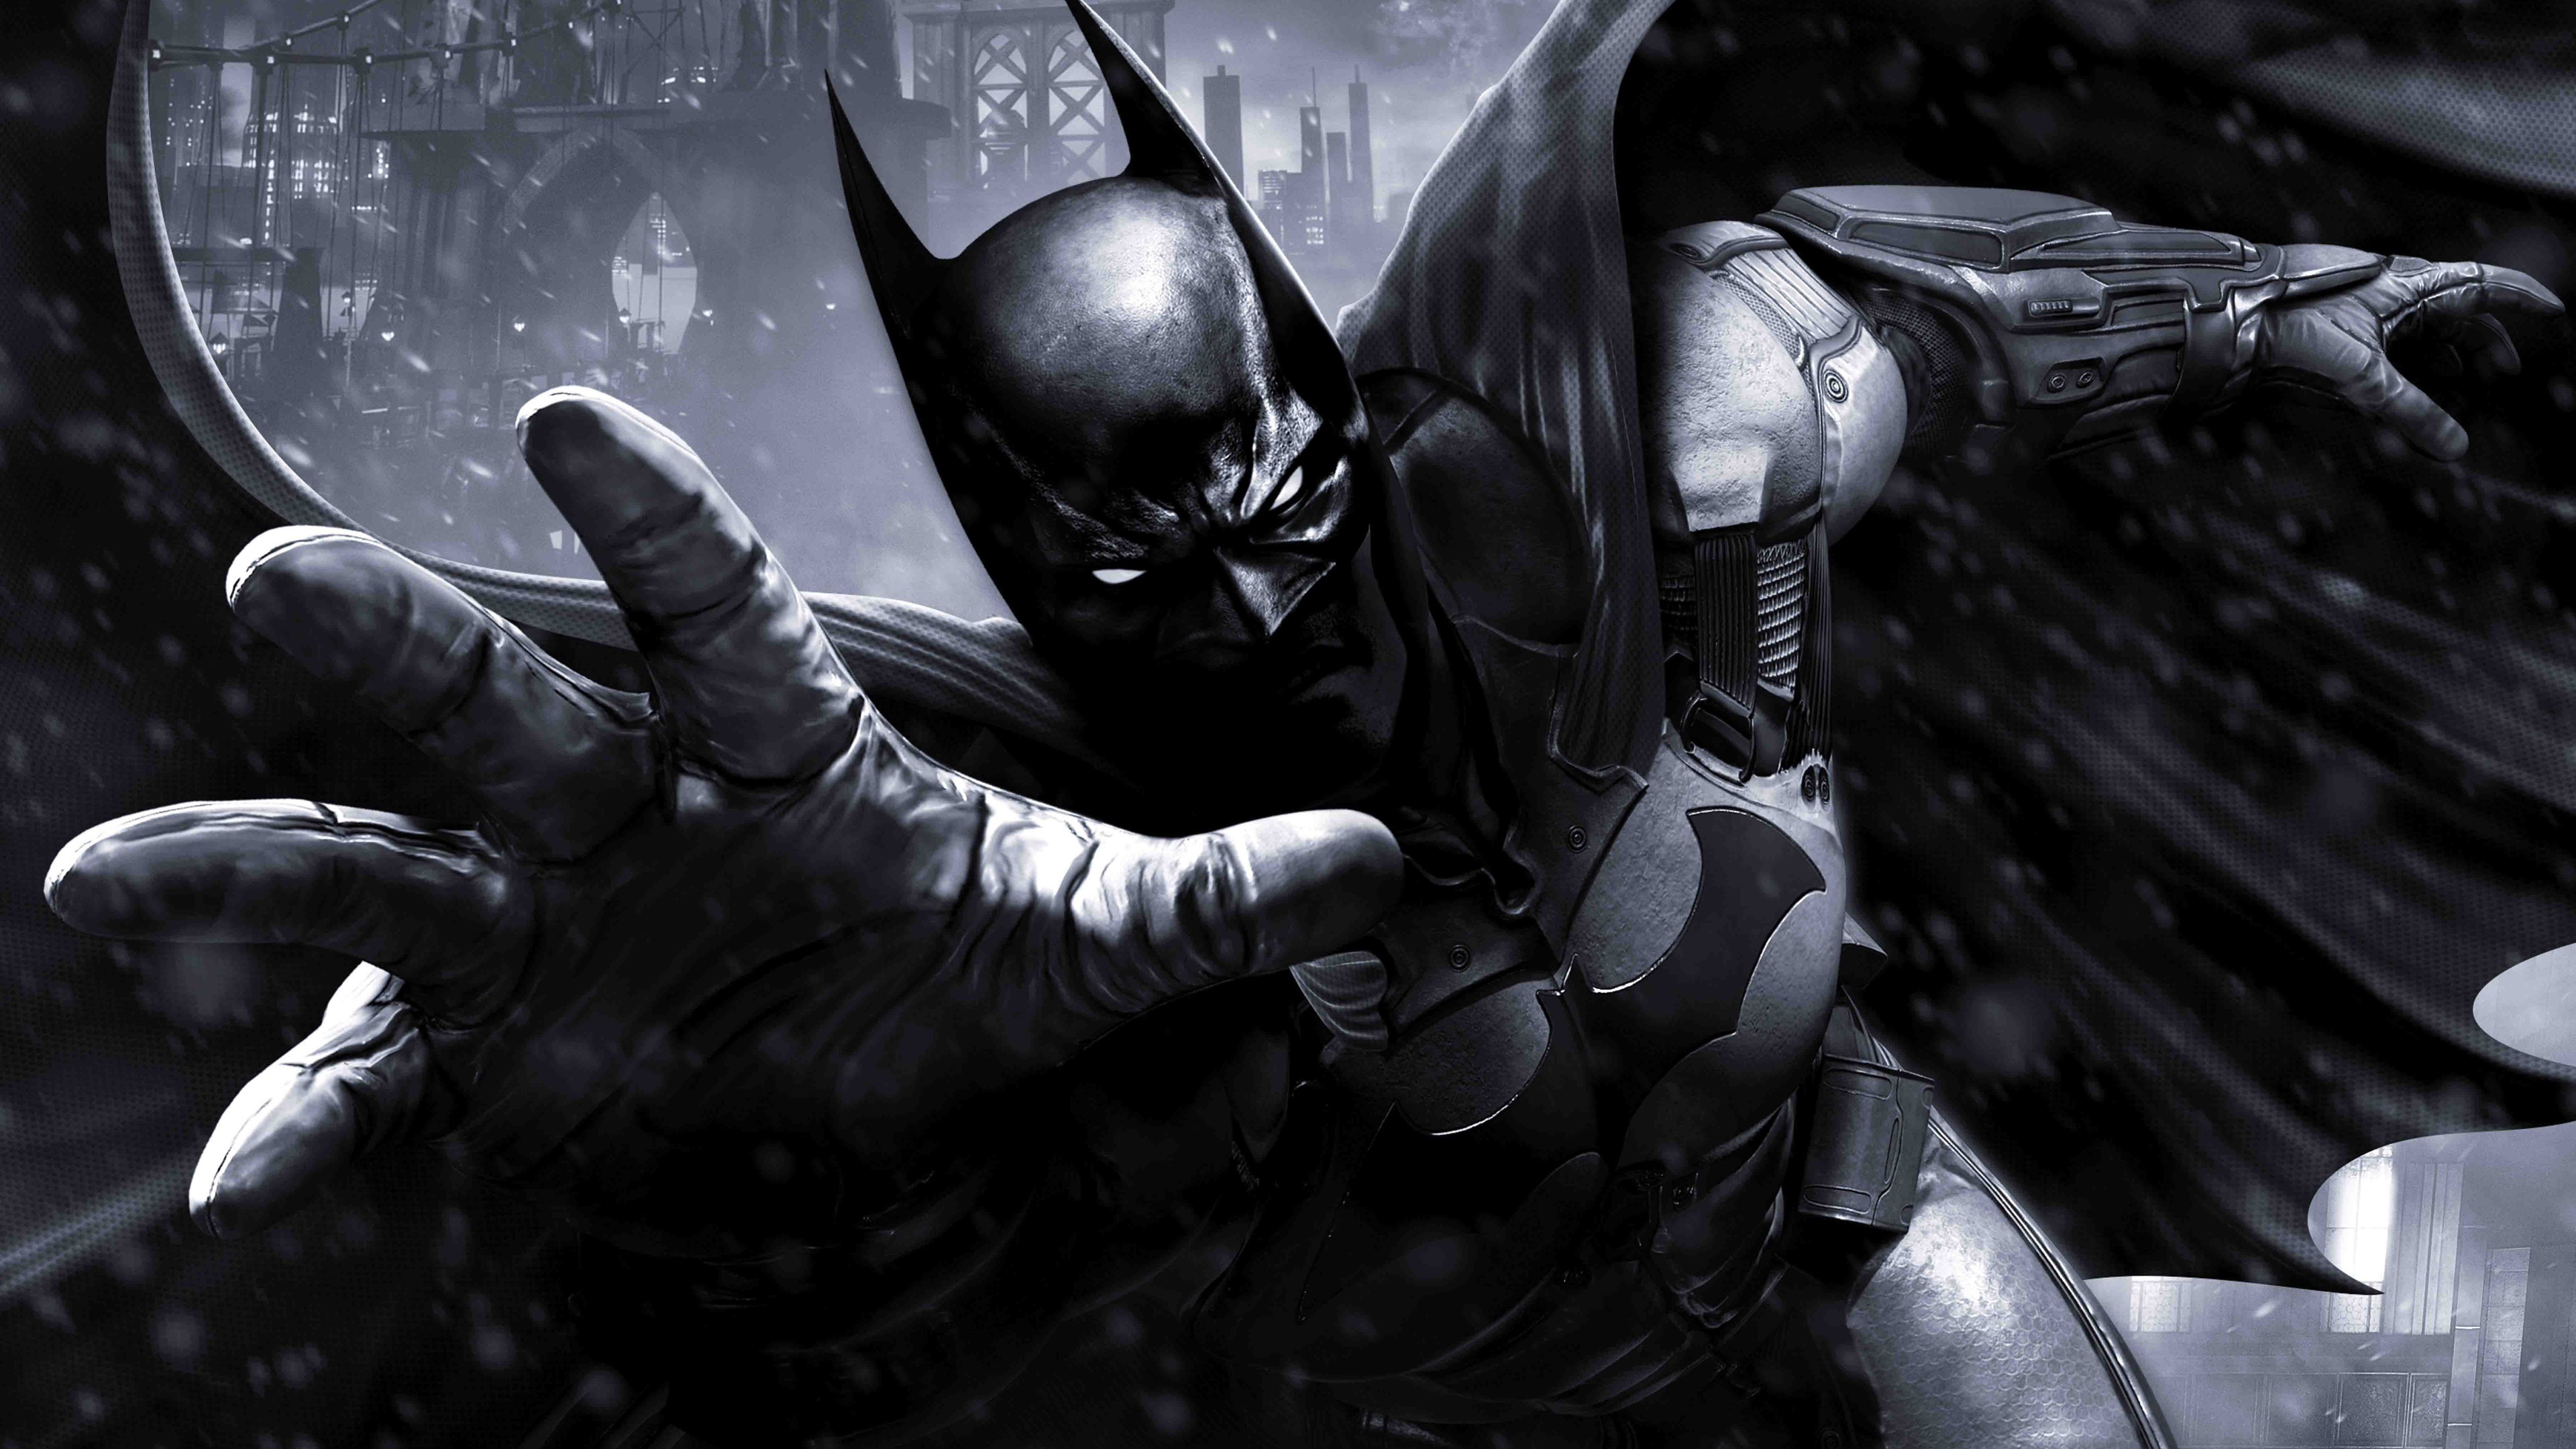 batman arkham knight8k 1537691705 - Batman Arkham Knight8k - hd-wallpapers, games wallpapers, batman wallpapers, batman arkham knight wallpapers, 8k wallpapers, 5k wallpapers, 4k-wallpapers